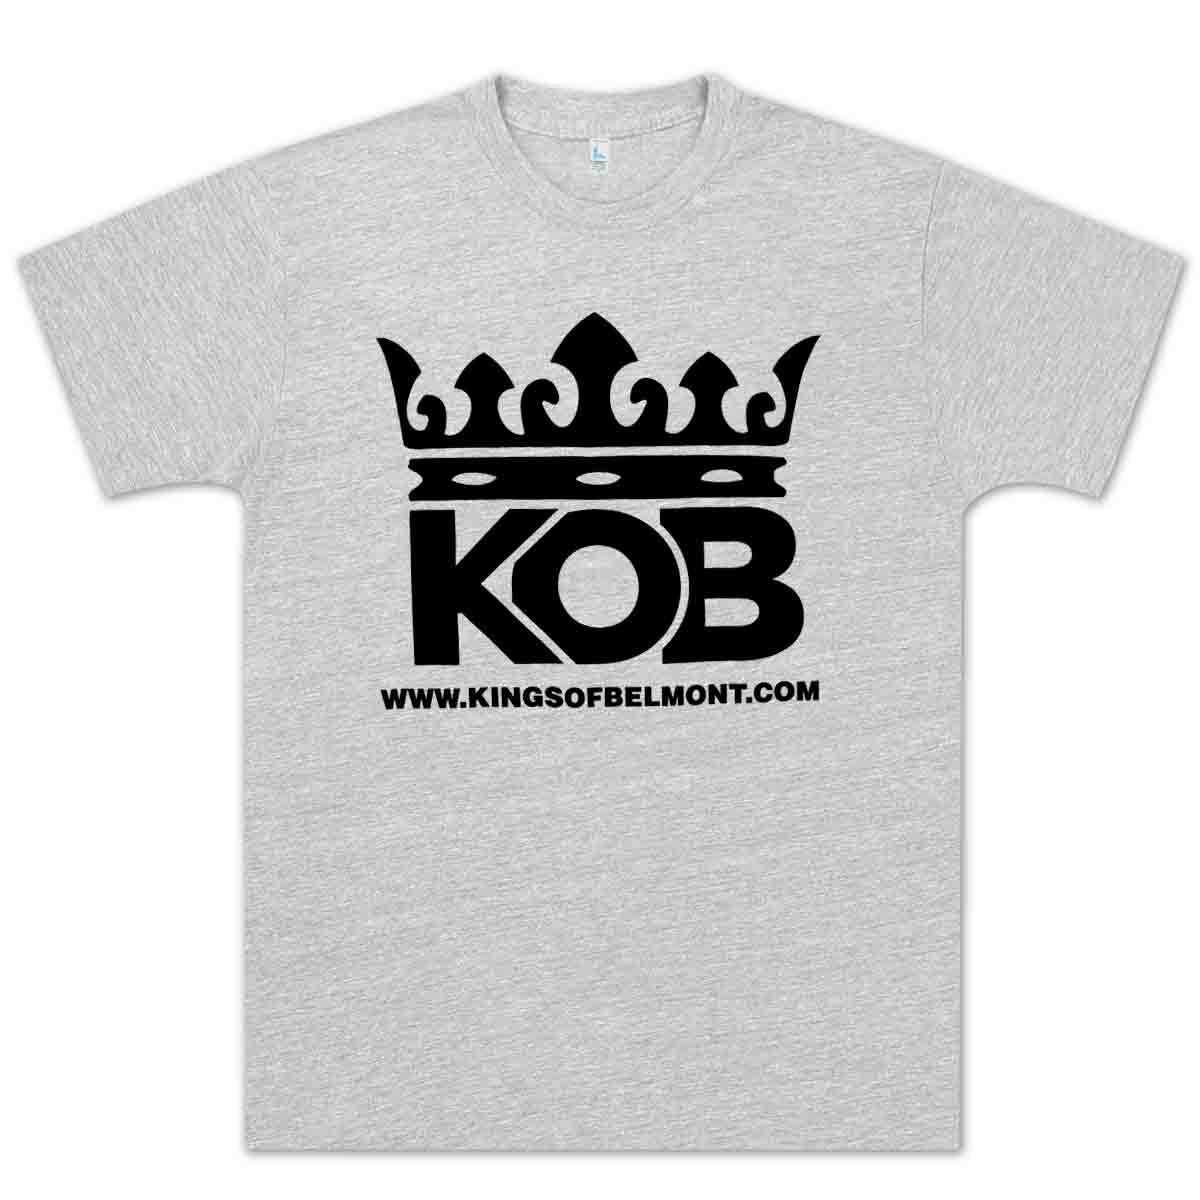 Kings of Belmont Logo Unisex T-Shirt - Heather Grey